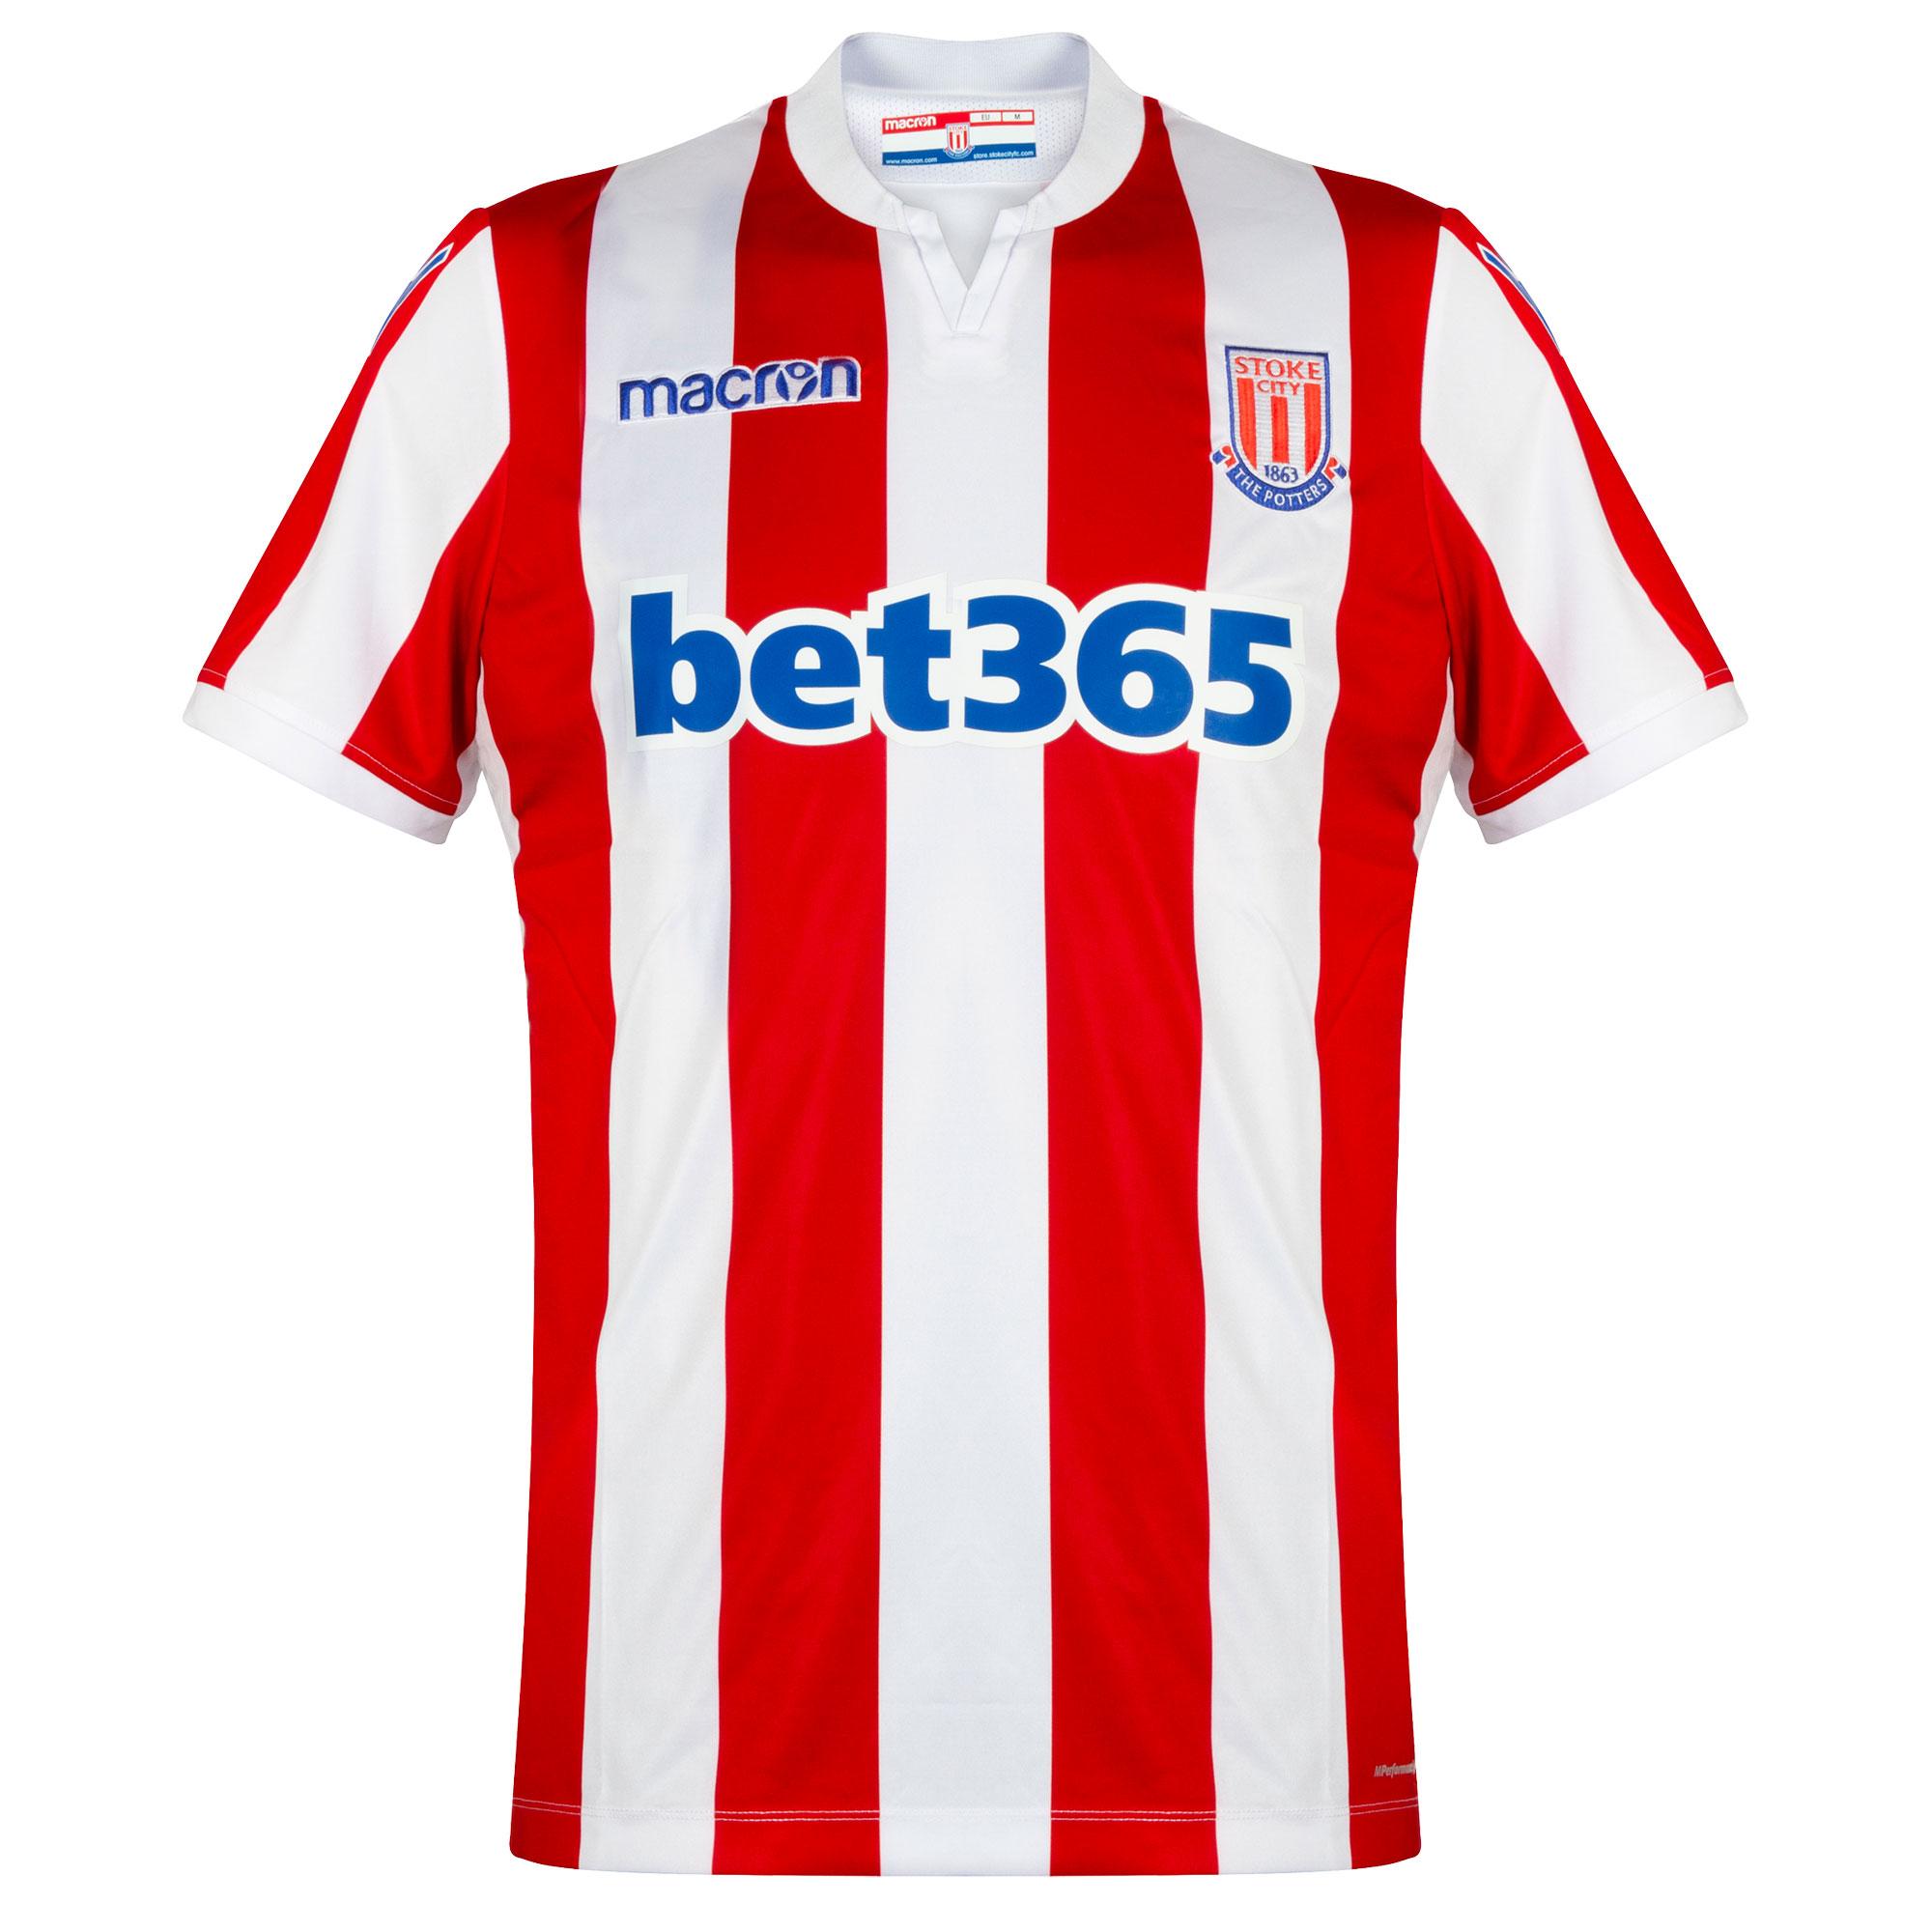 Stoke City Home shirt